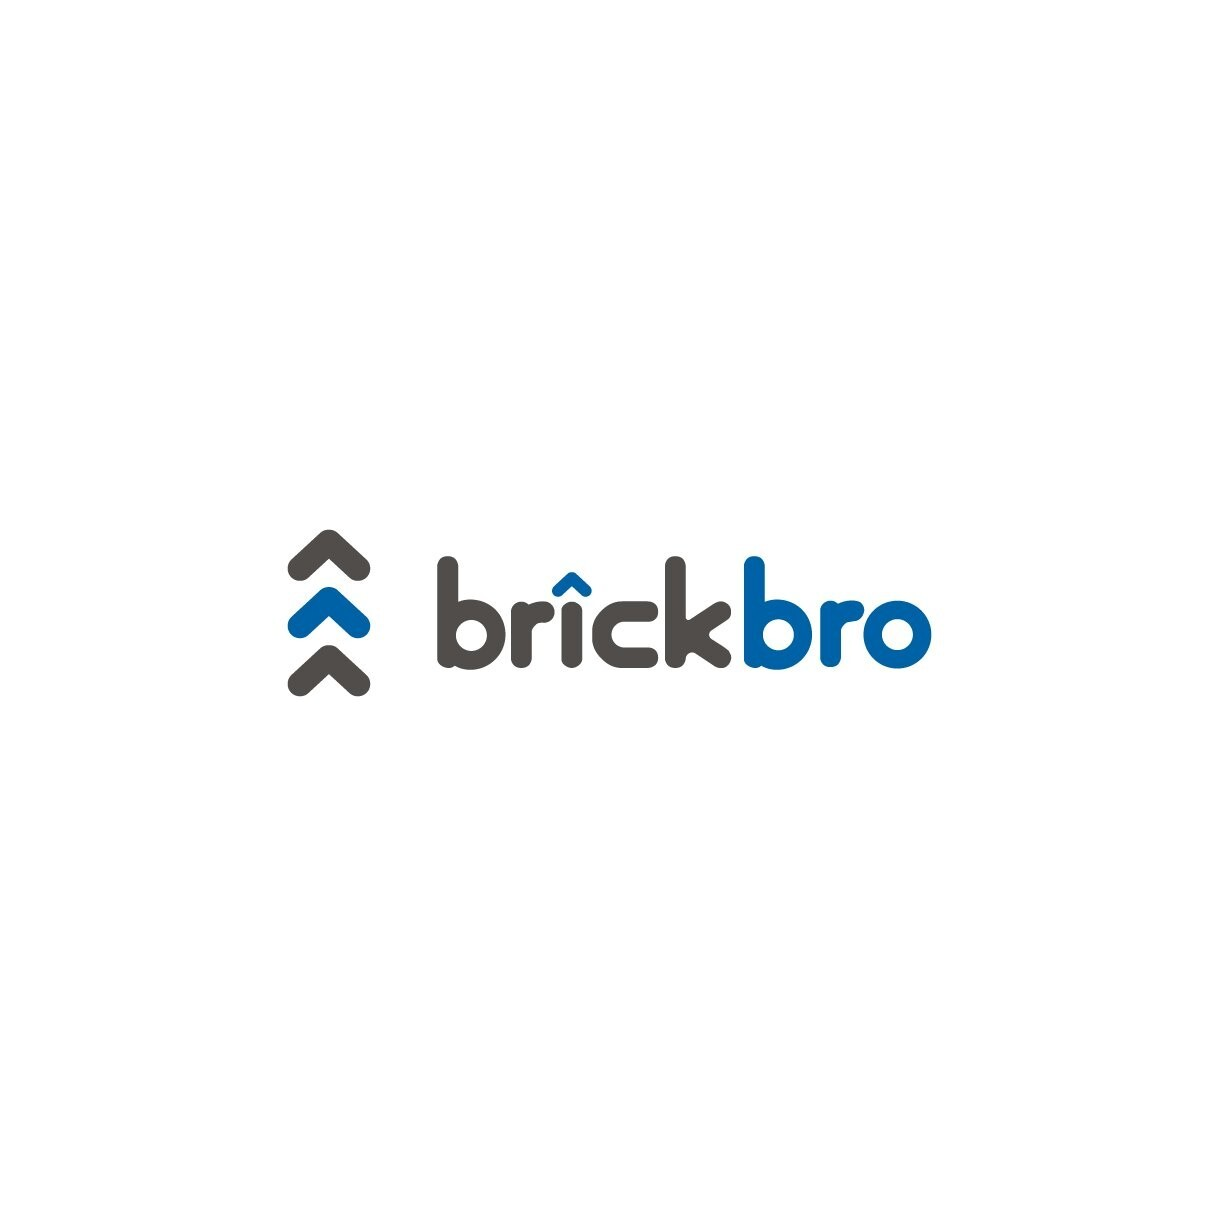 Brickbro